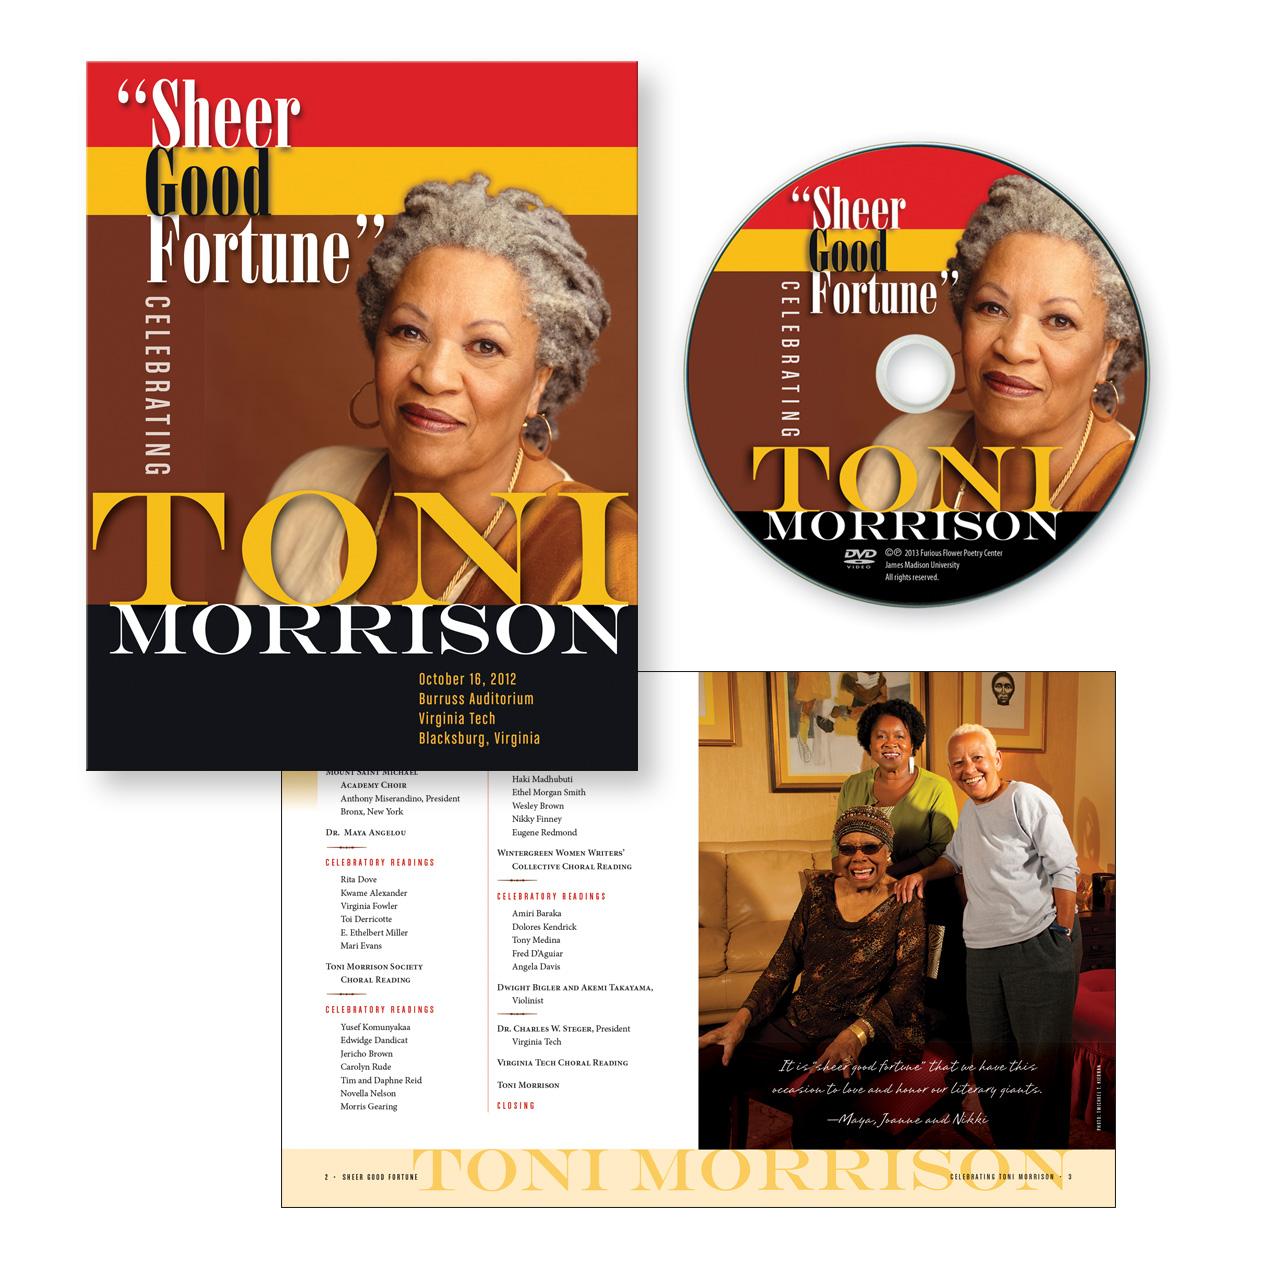 Sheer Good Fortune honoring Toni Morrison